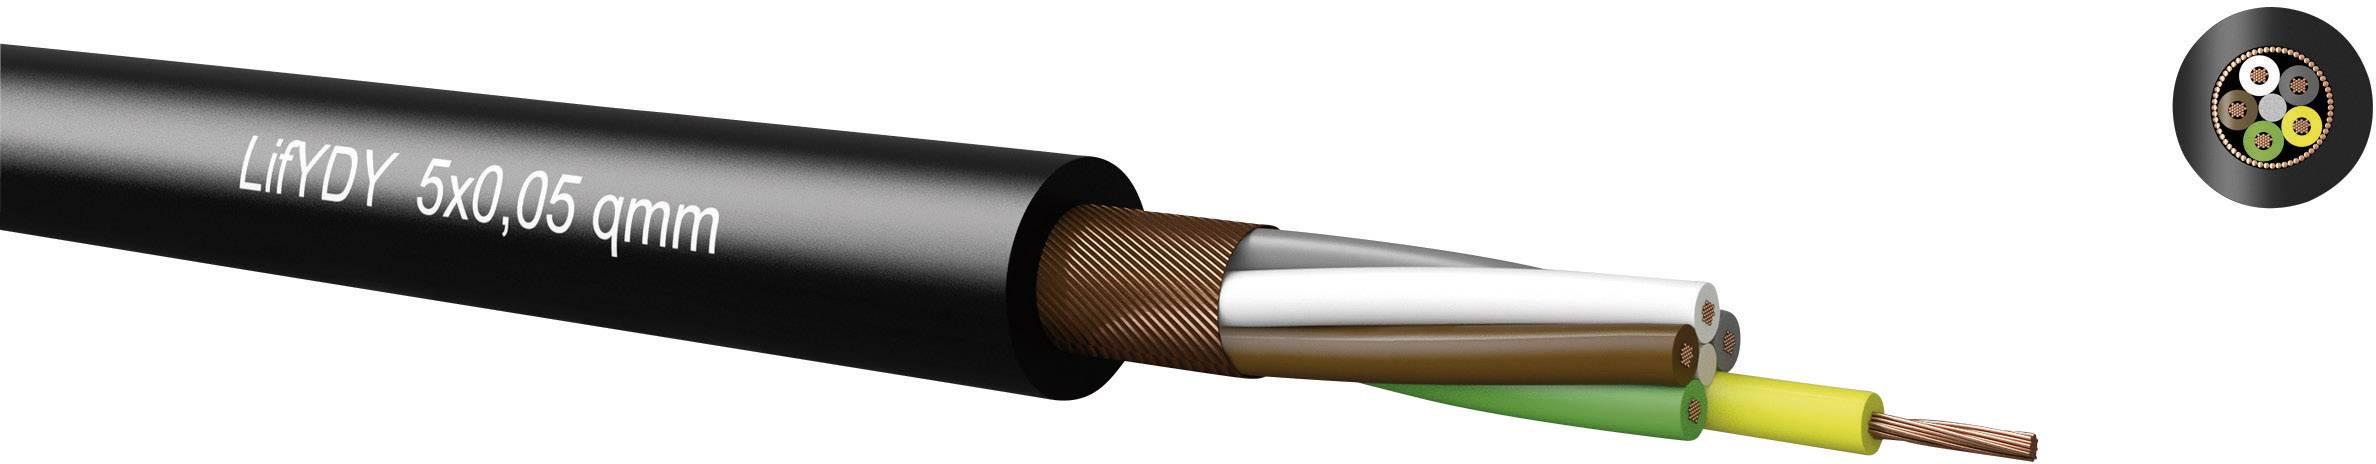 Riadiaci kábel Kabeltronik LifYDY 340300500, 3 x 0.05 mm², vonkajší Ø 2.80 mm, 100 V, metrový tovar, čierna